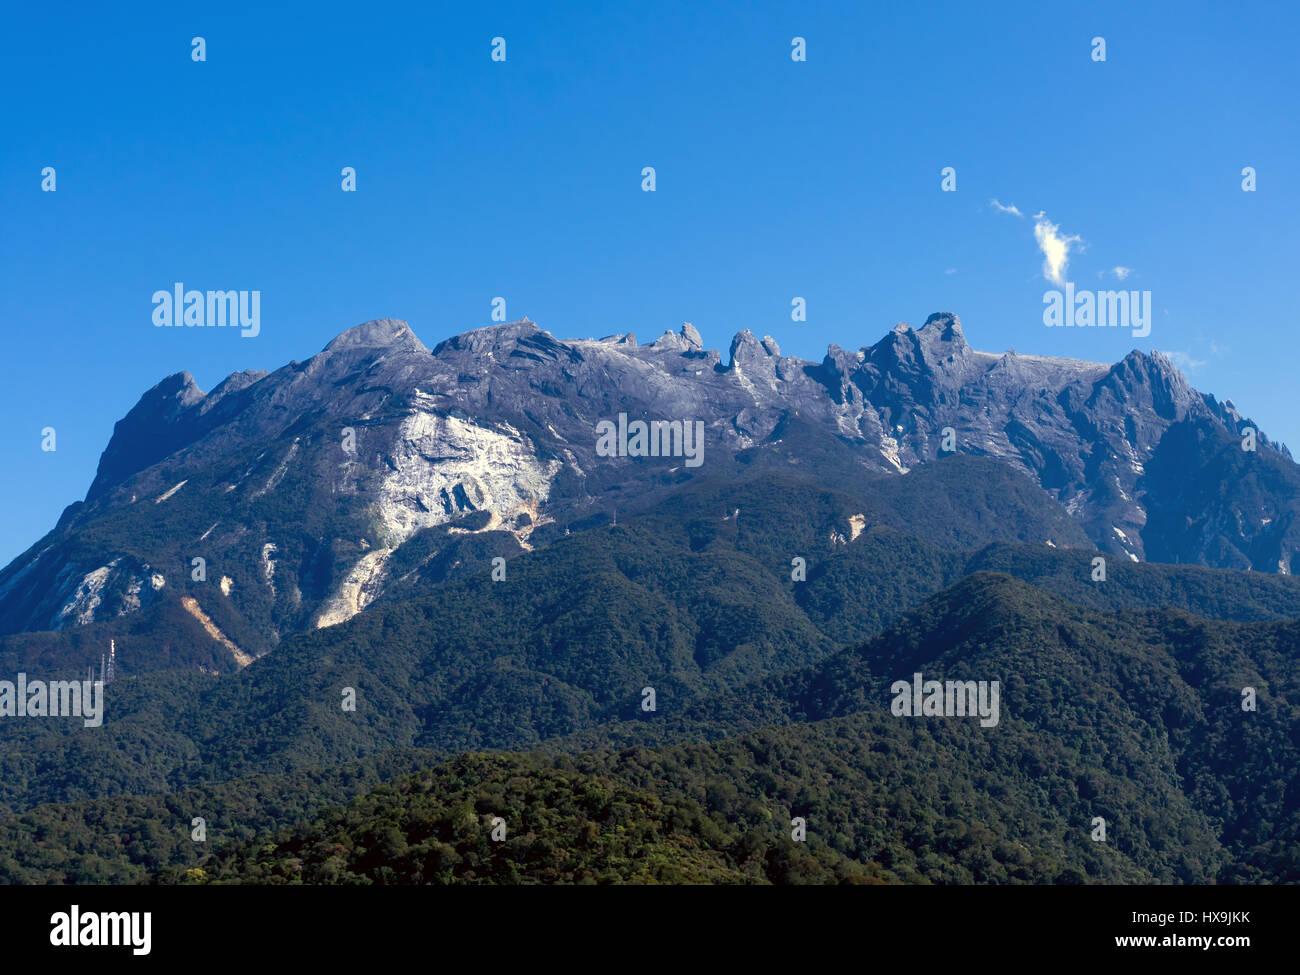 Malaysia Sabah Borneo scenic view of Mount Kinabalu. - Stock Image